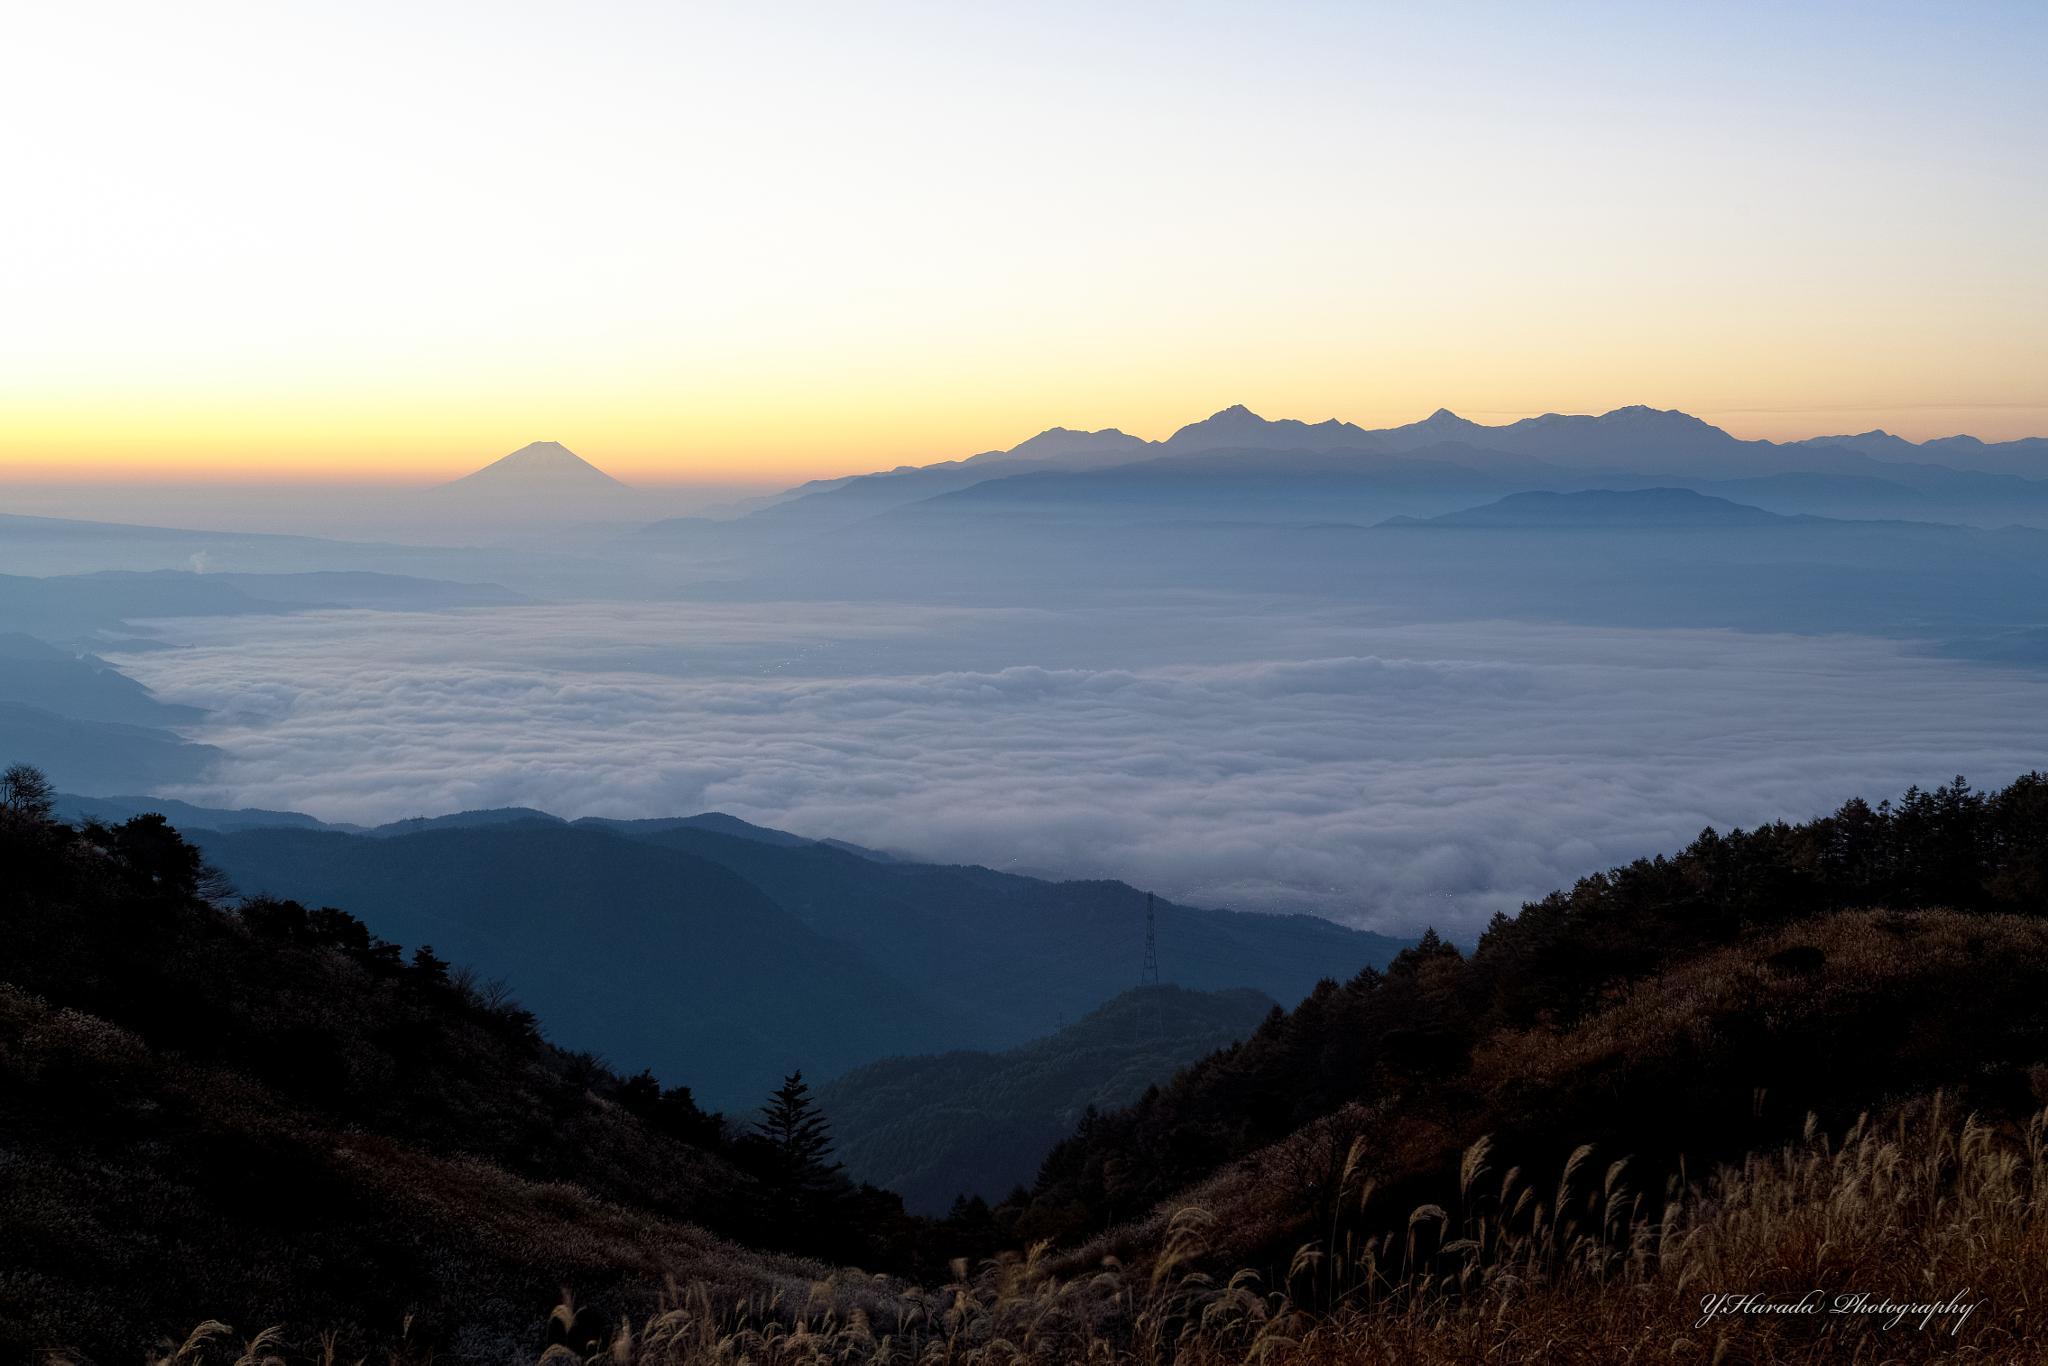 Mt.Fuji by Yuichi Harada